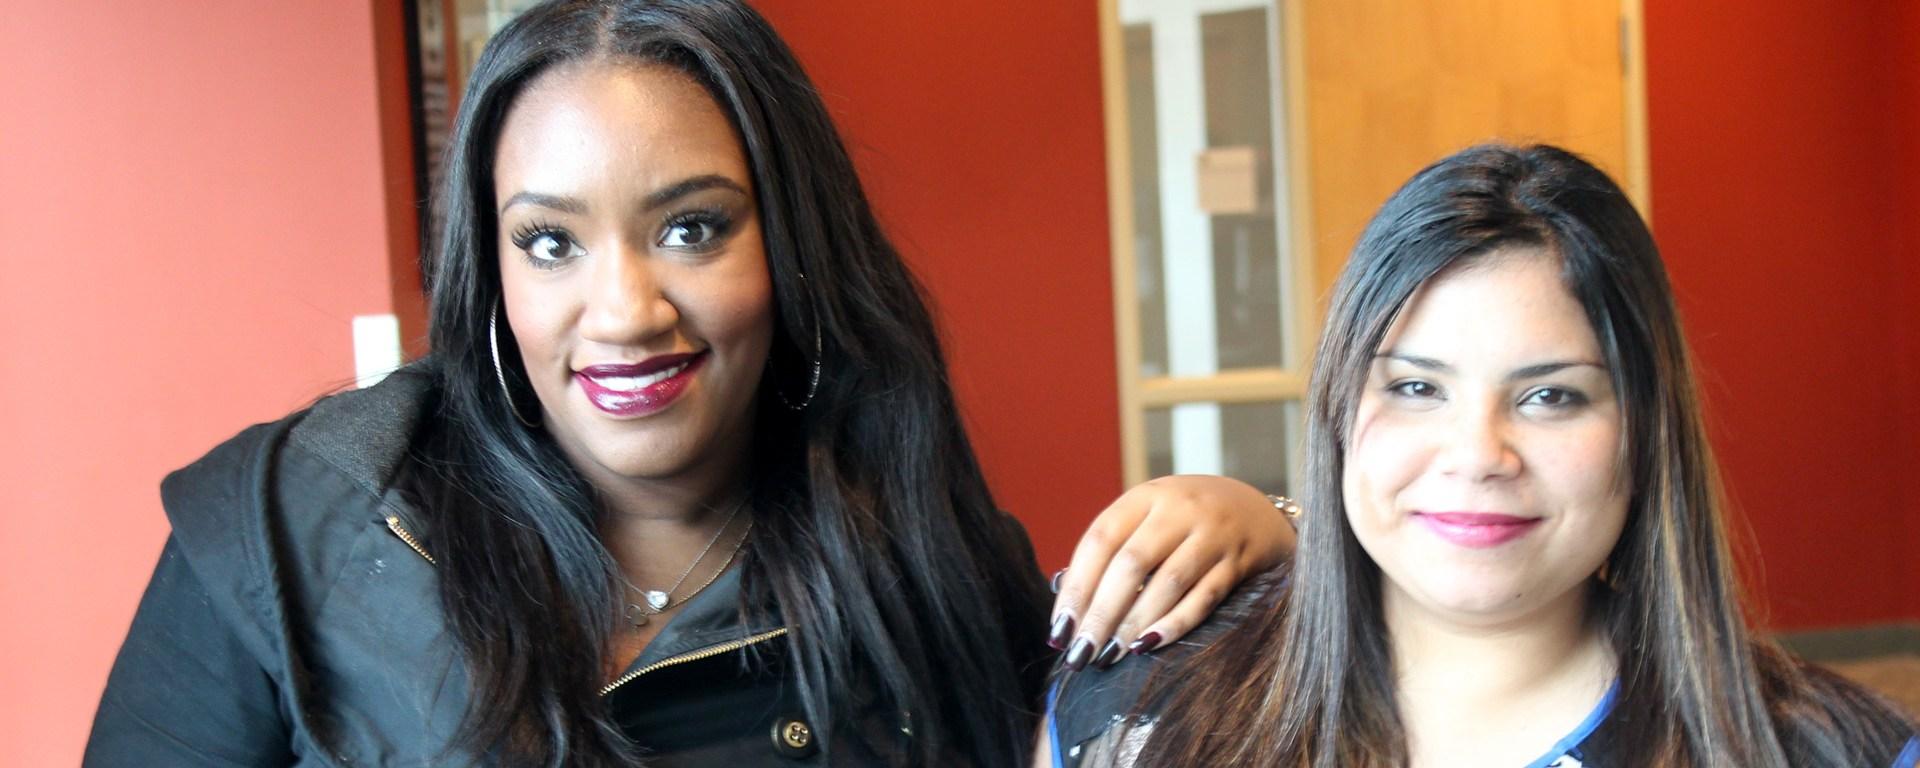 Veronica Vioude and Yamilette Rosado